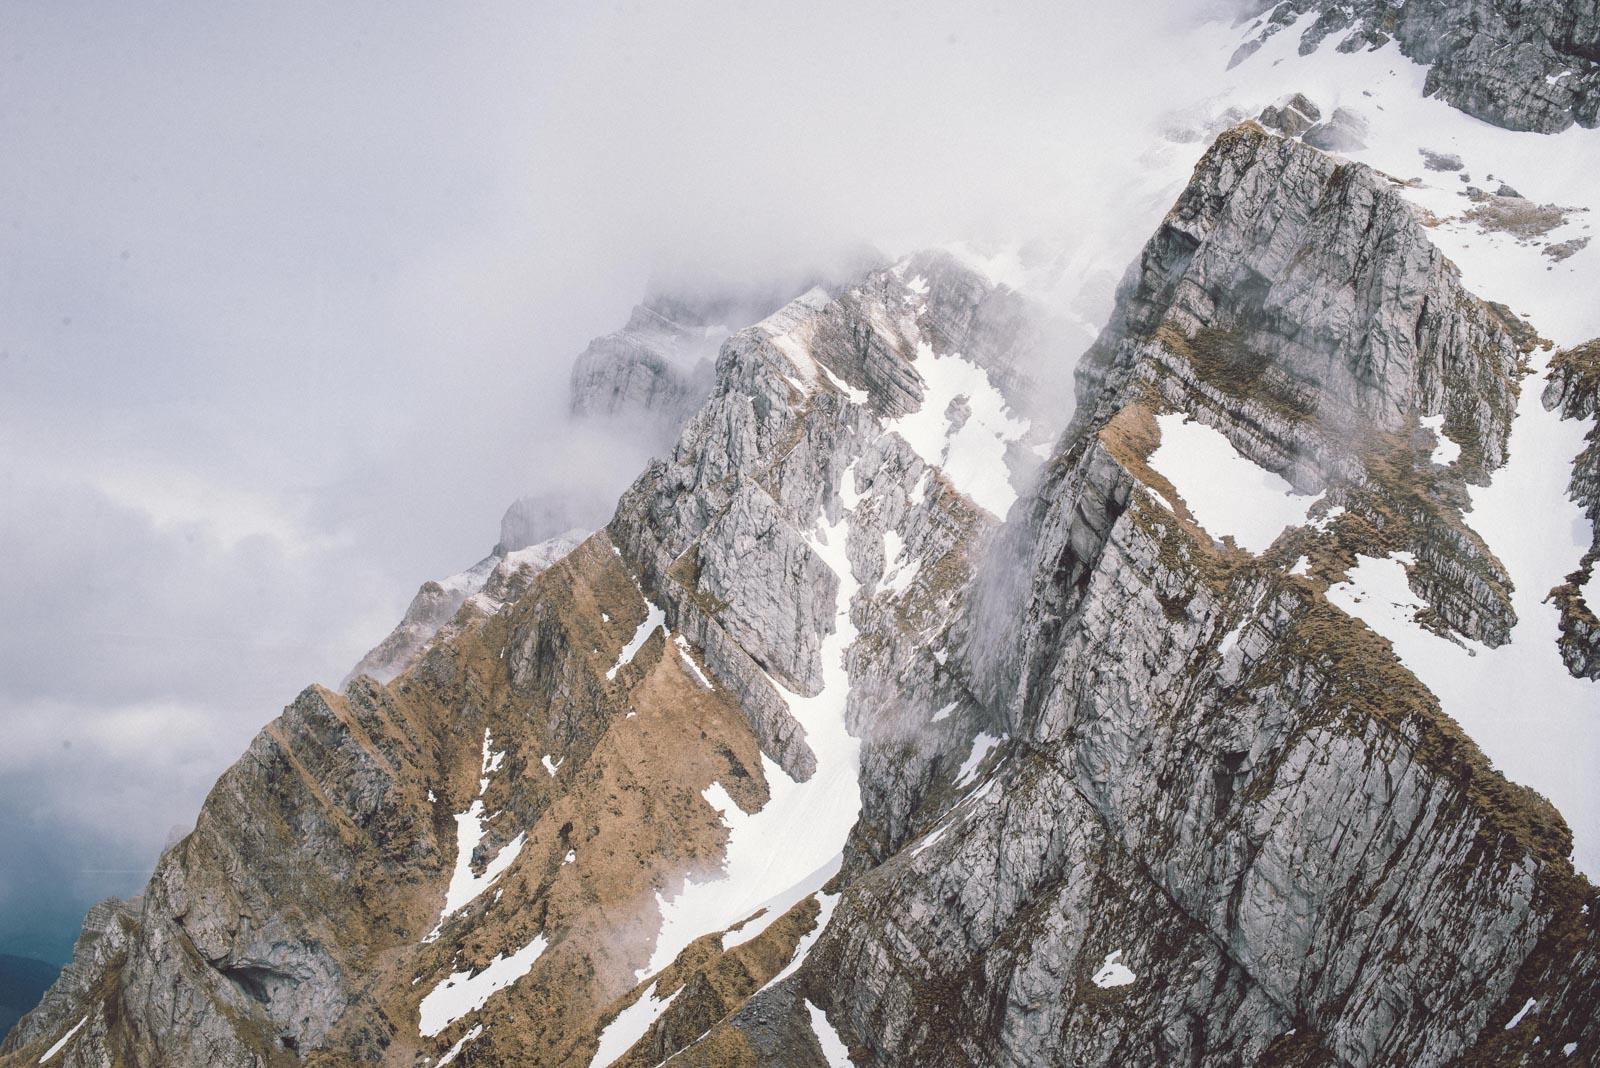 Alpen wir kommen (Photo by Nina Strehl on Unsplash)